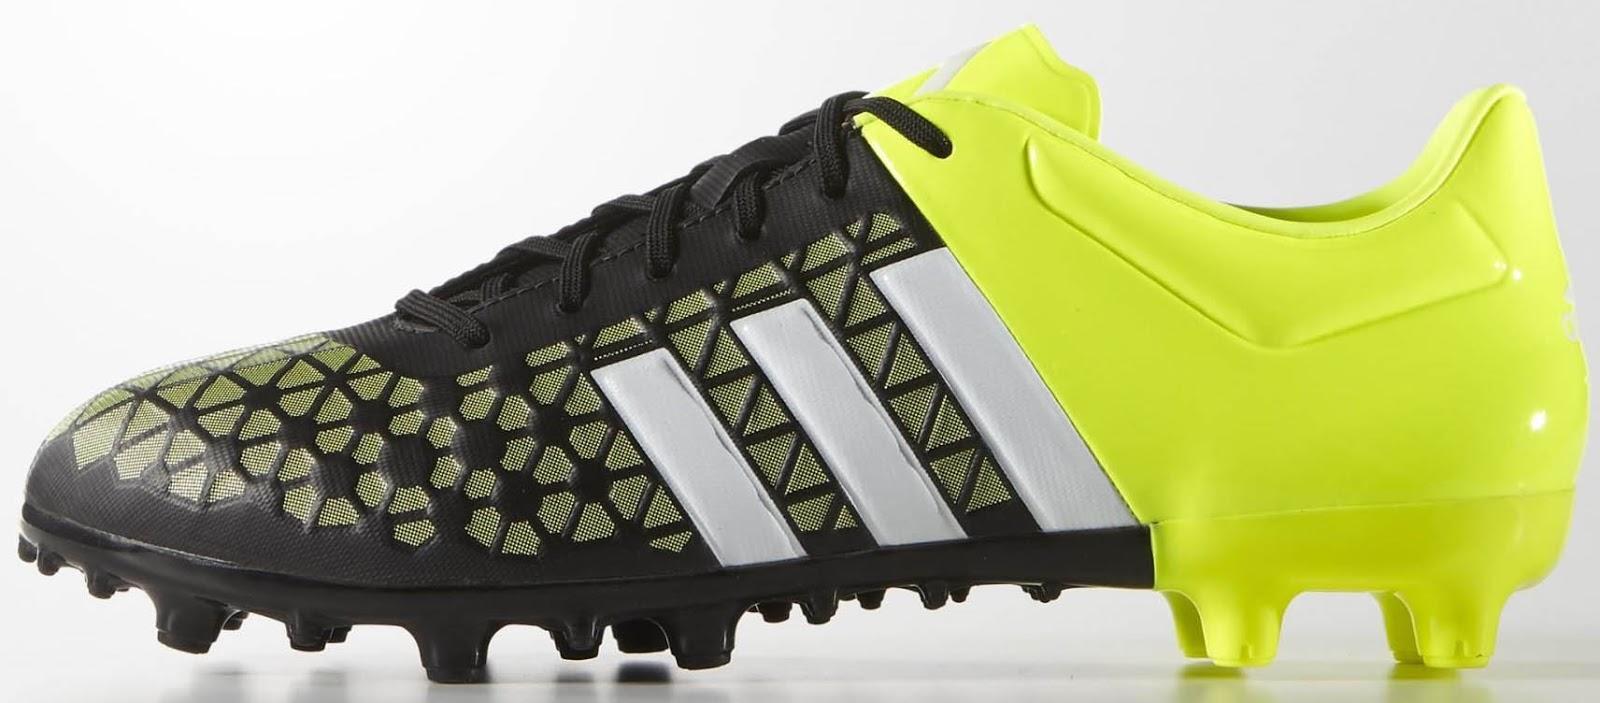 Adidas Ace 15.3